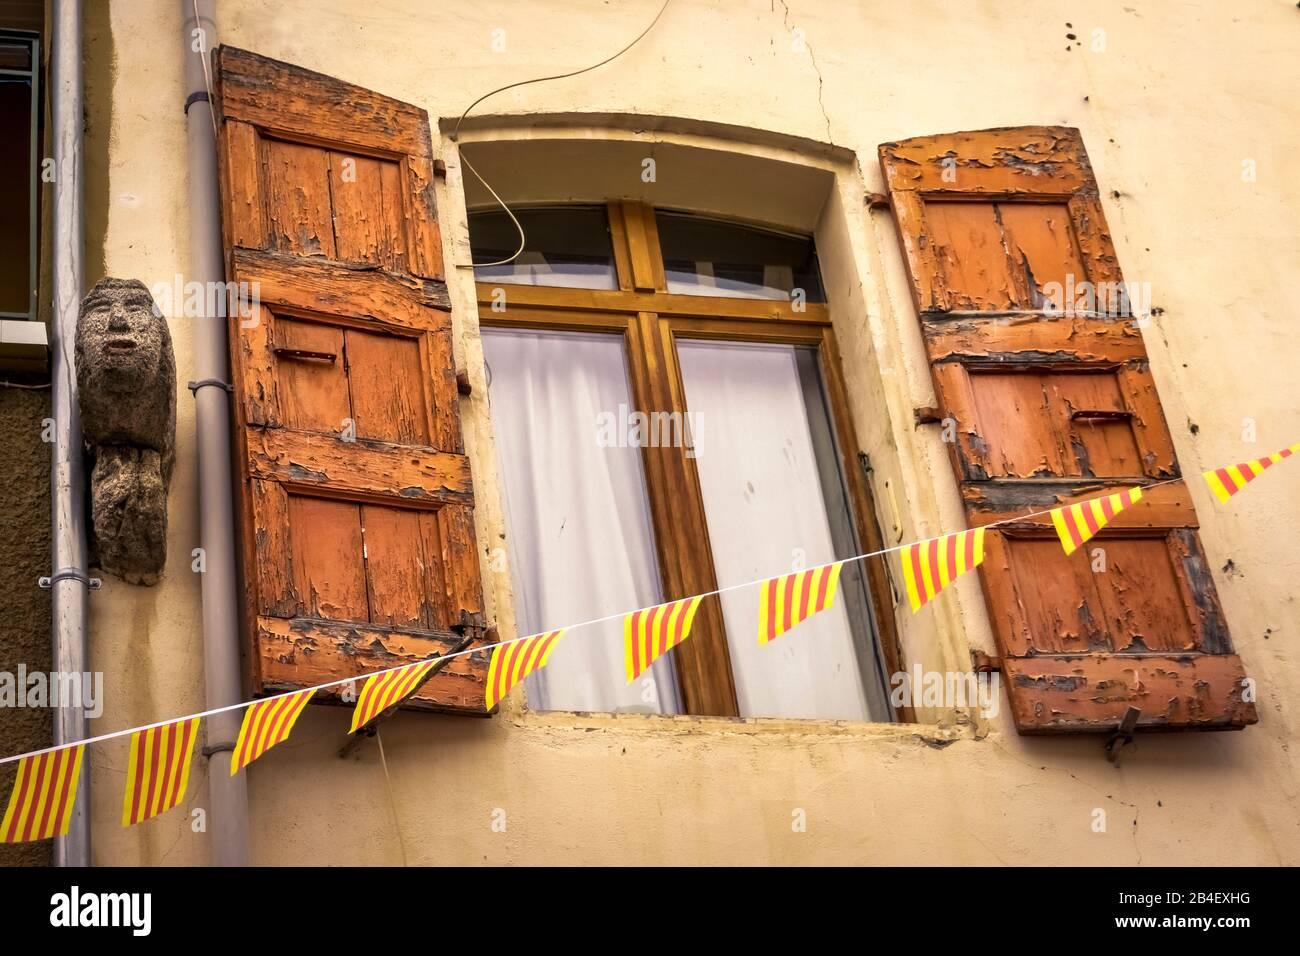 Ventana con persianas de madera en Molitg les Bains Foto de stock